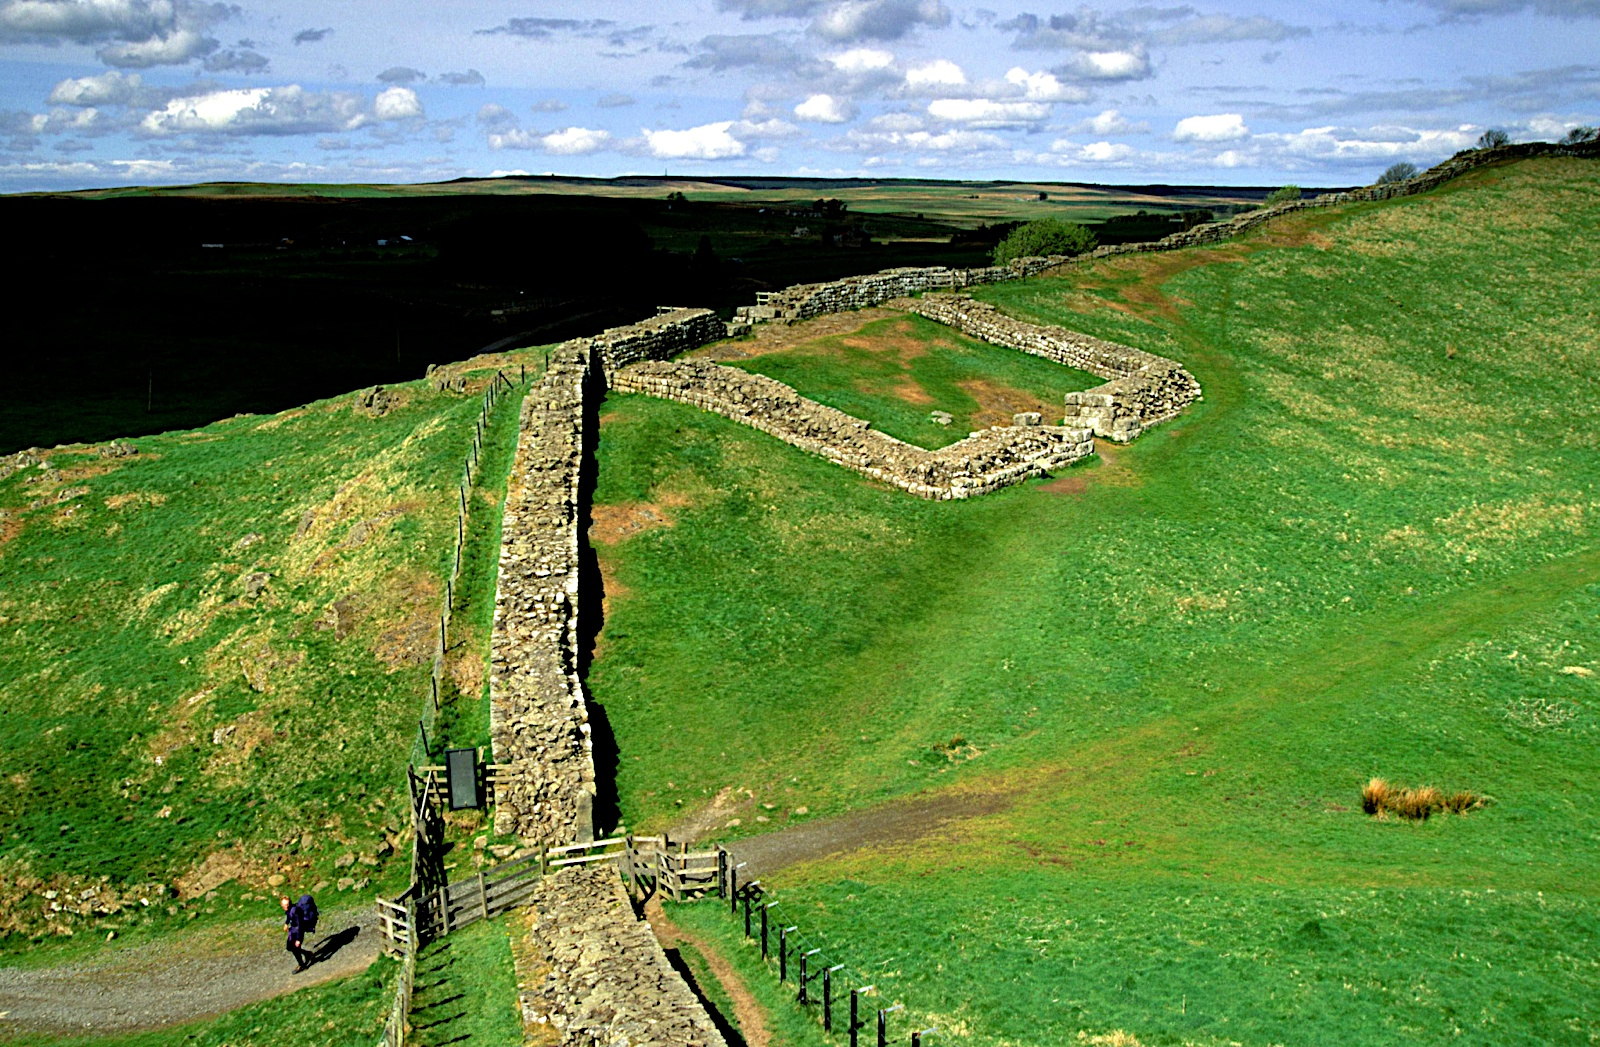 Cawfields Mile Caste, Hadrian's Wall, England - panoramio.jpg